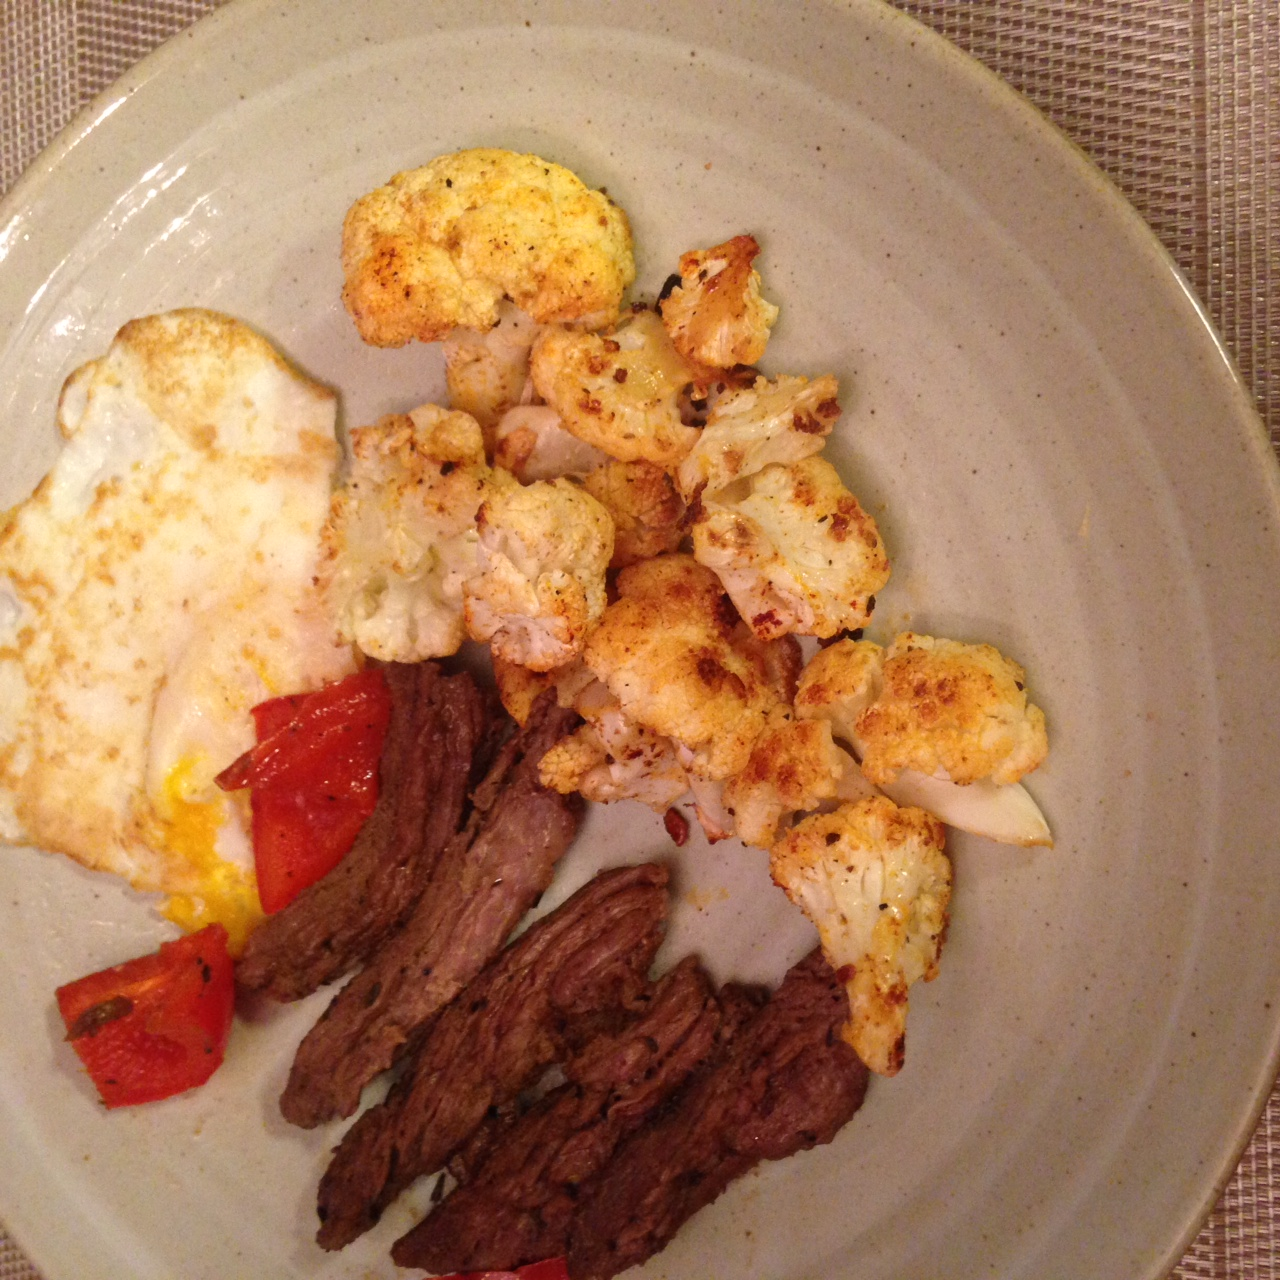 Dinner at home: skirt steak, eggs, grilled red peppers, roasted cauliflower